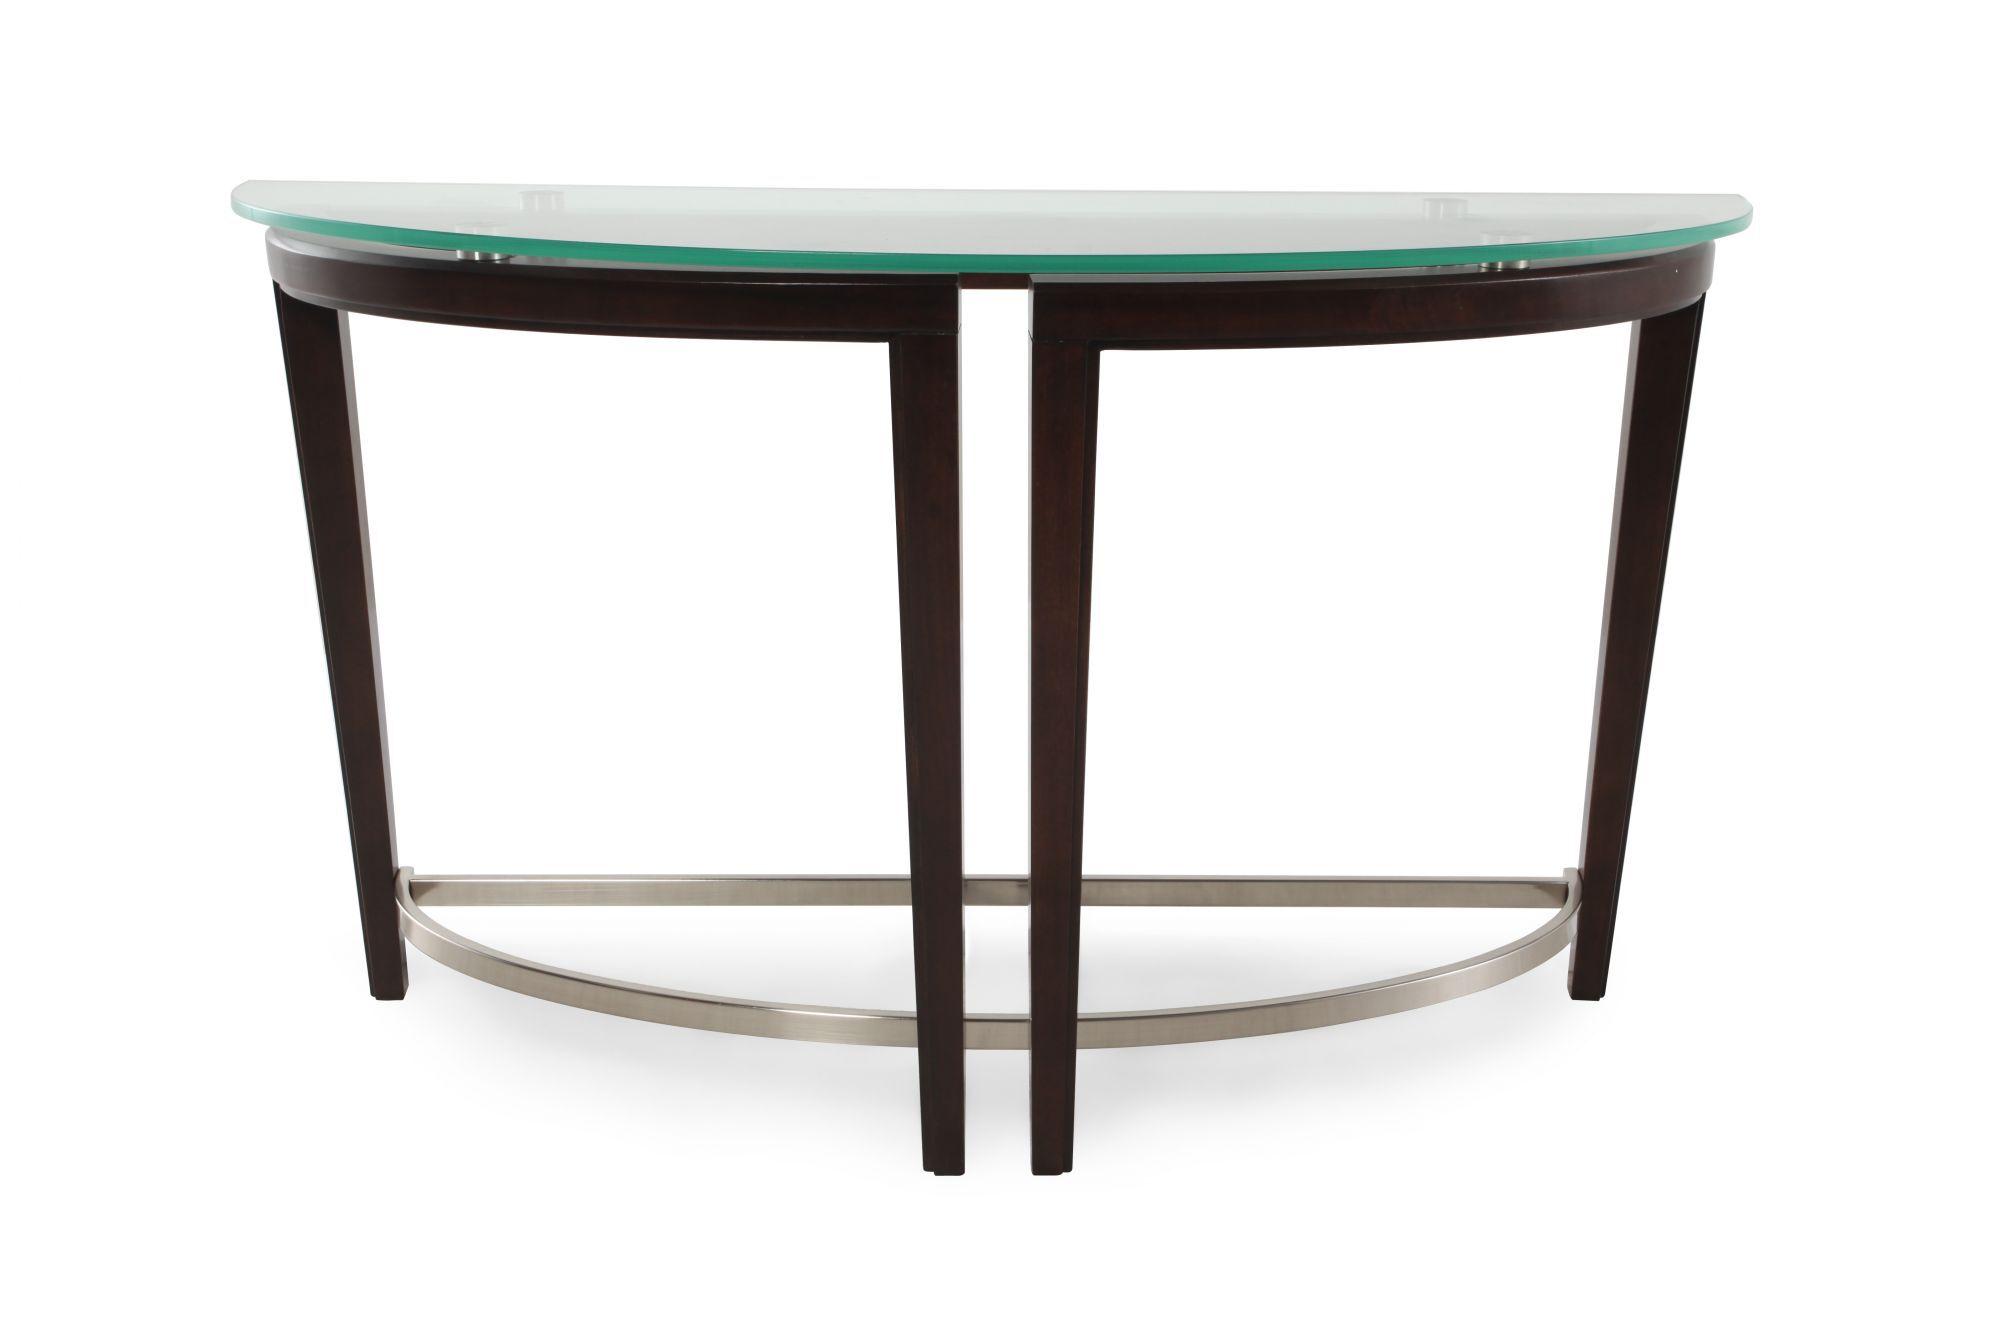 magnussen home carmen sofa table - White Sofa Table